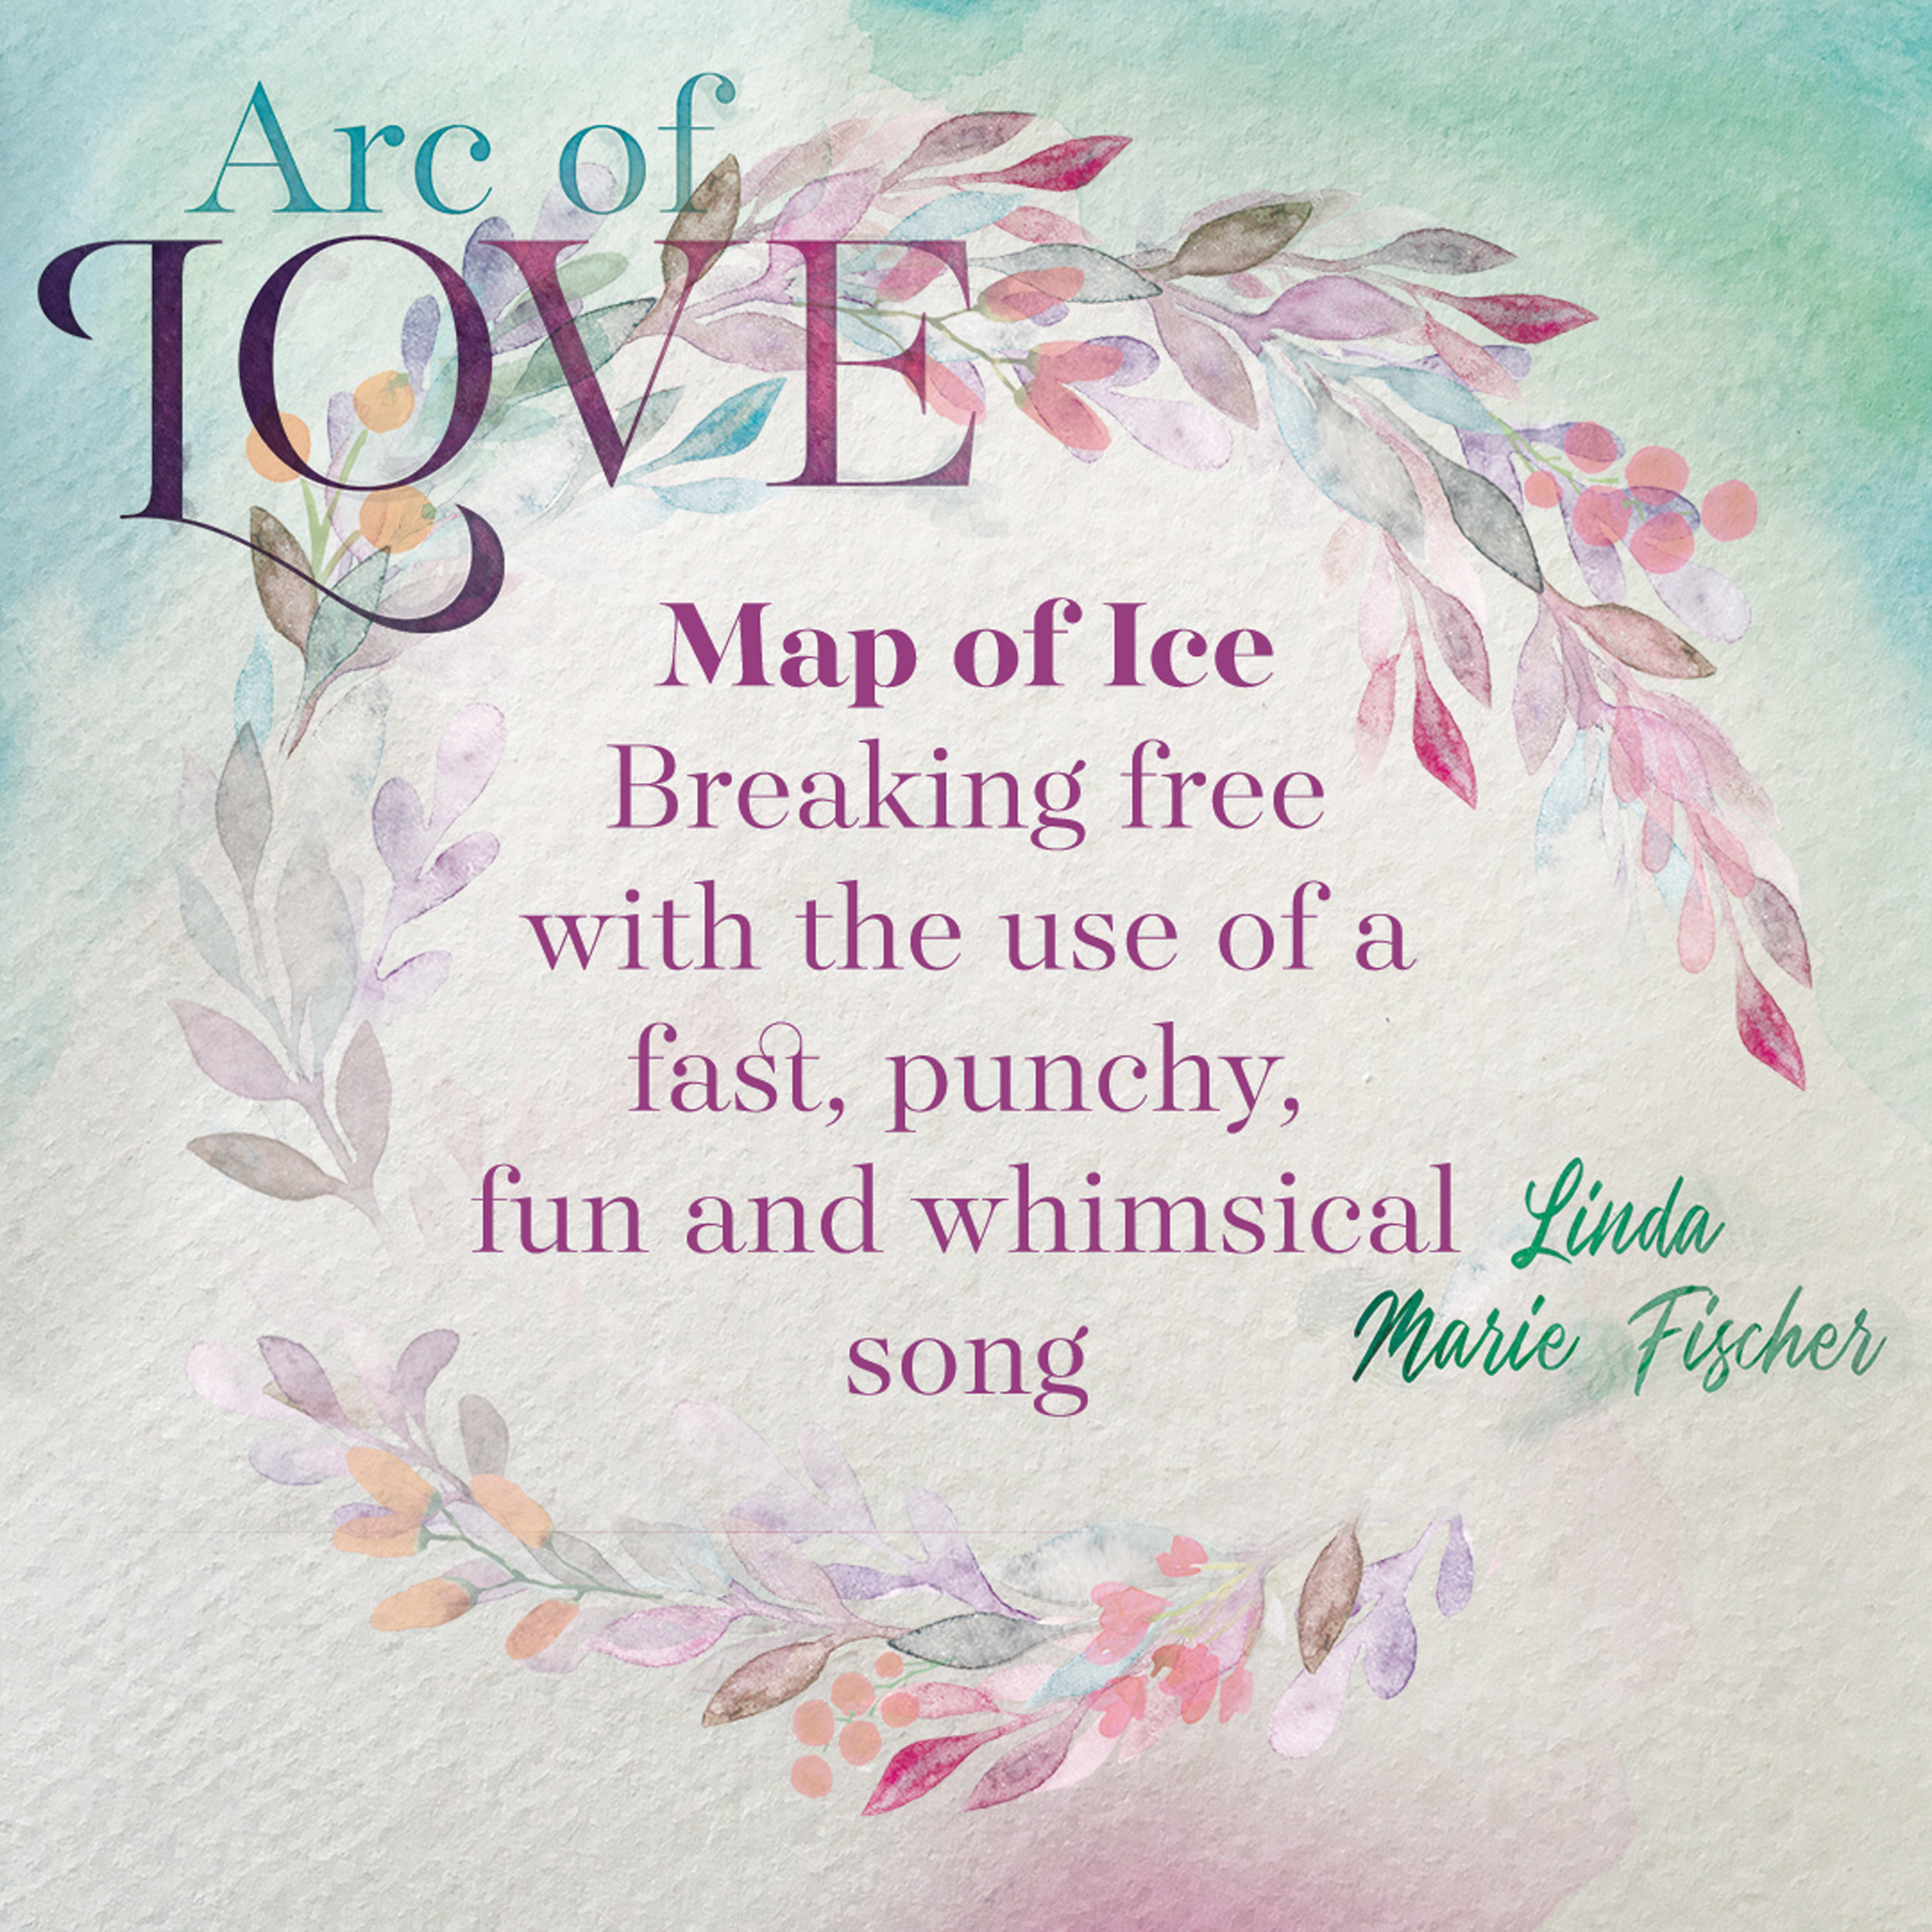 Arc of Love - Map of Ice.jpg